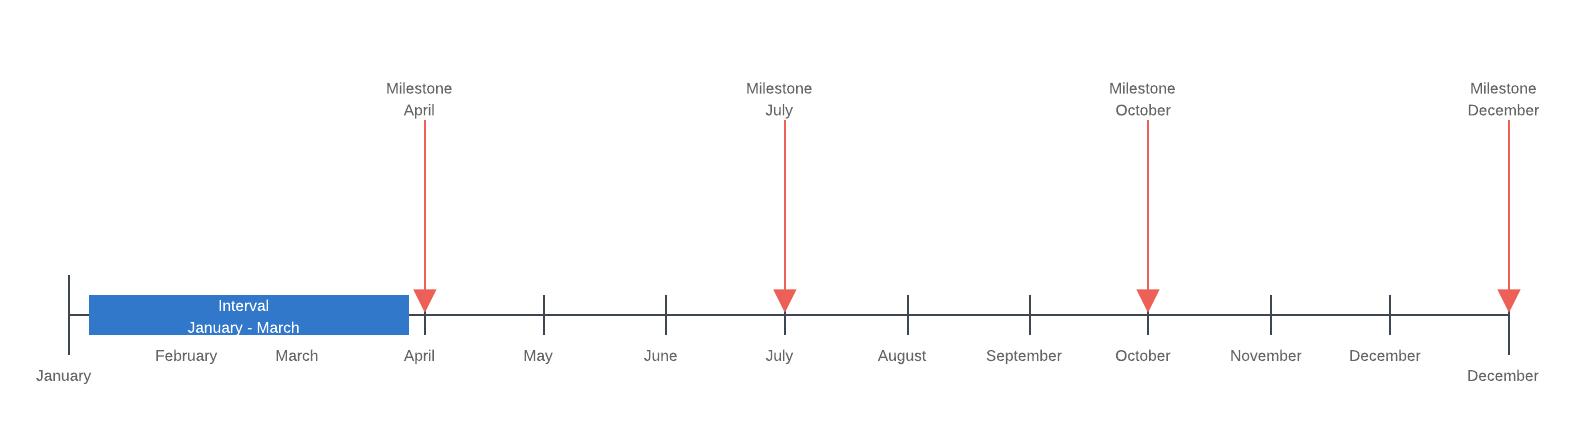 Project Milestones Timeline Template